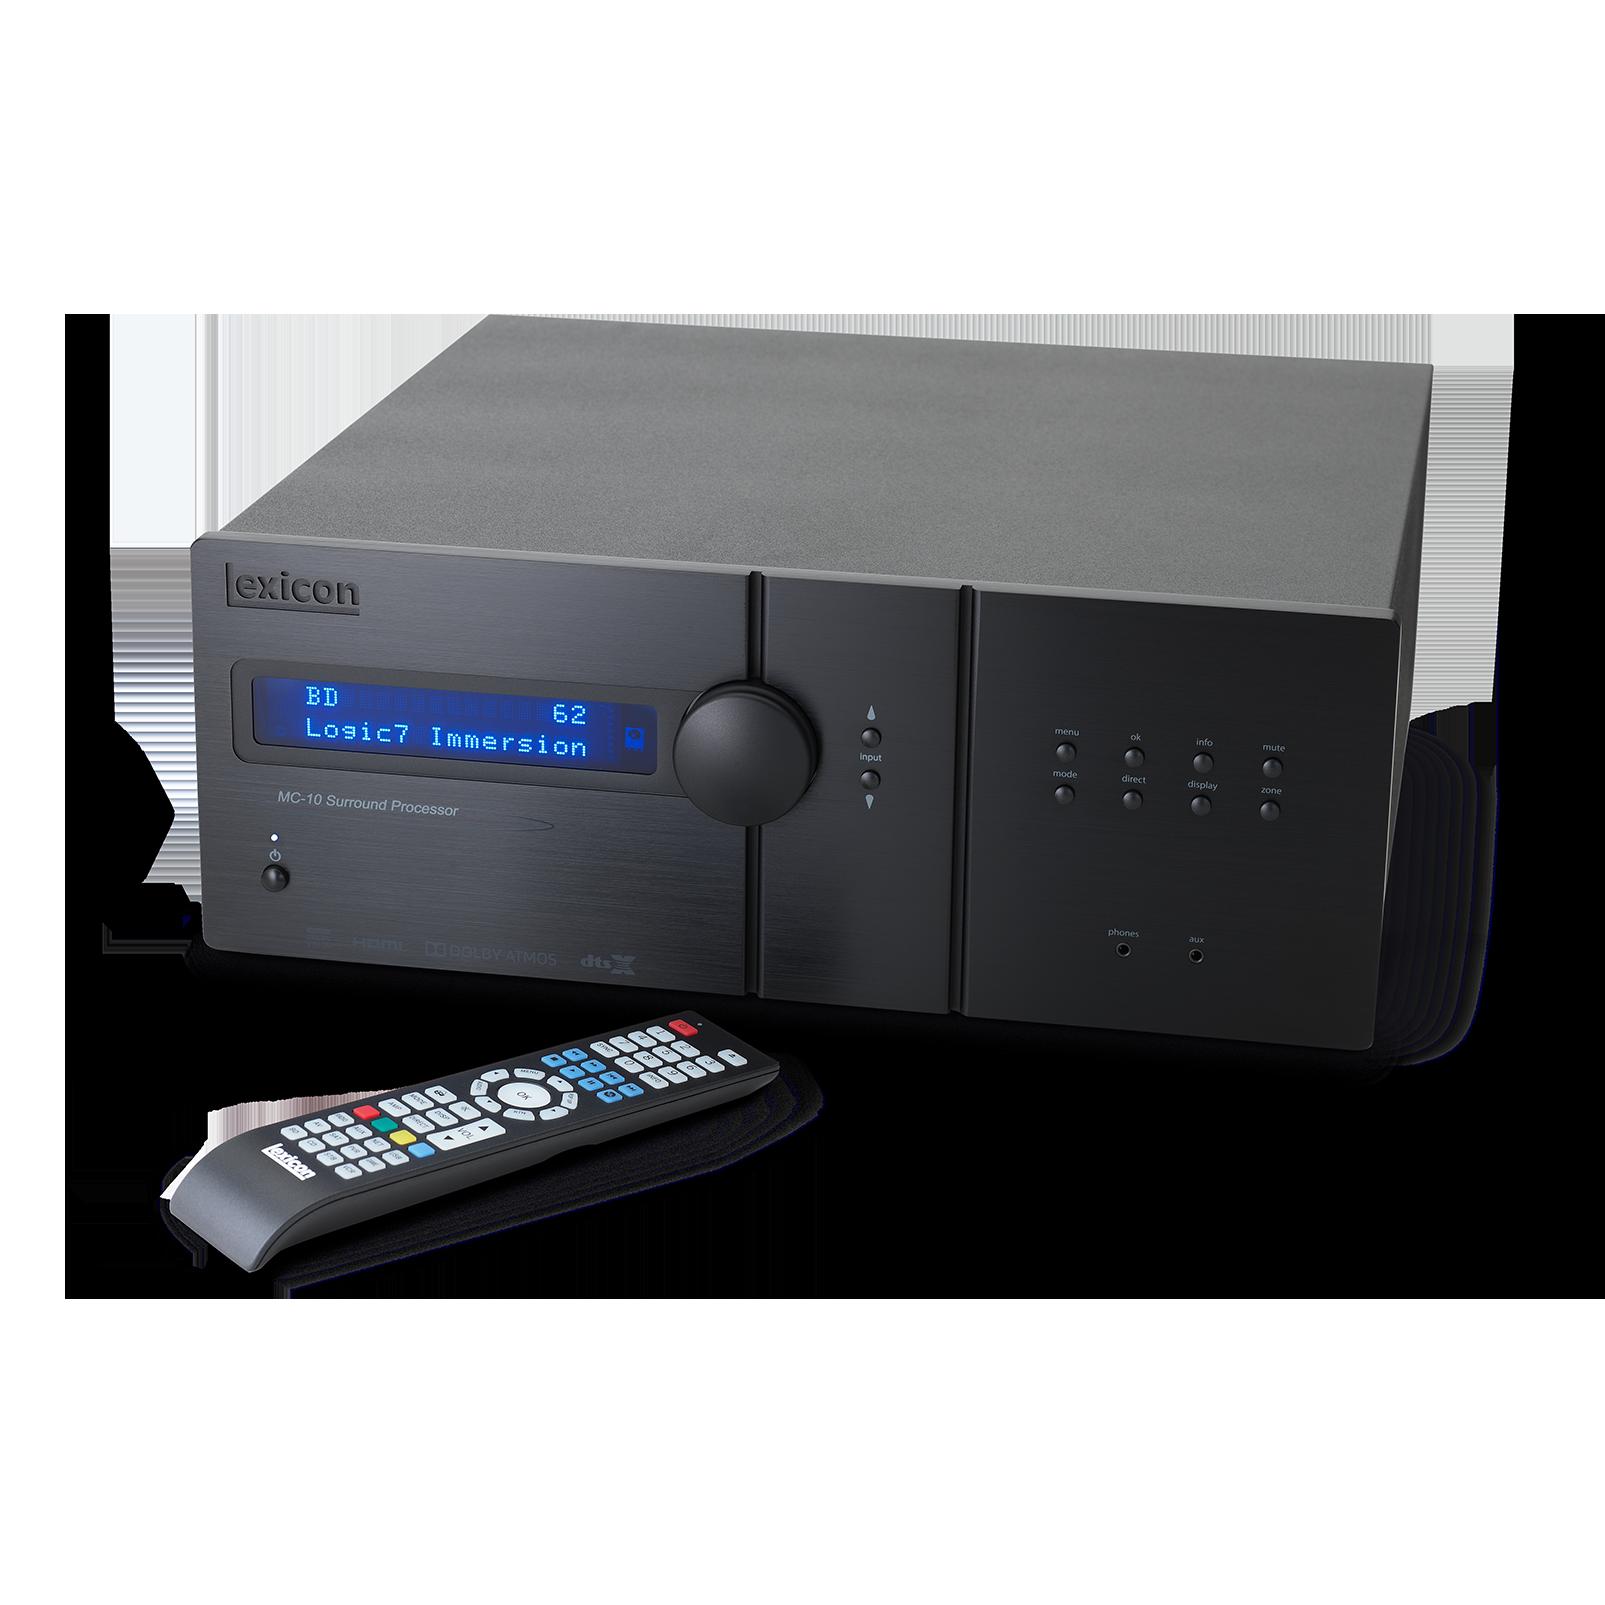 Lexicon MC-10 - Black - Immersive Surround Sound AV Processor - Detailshot 1